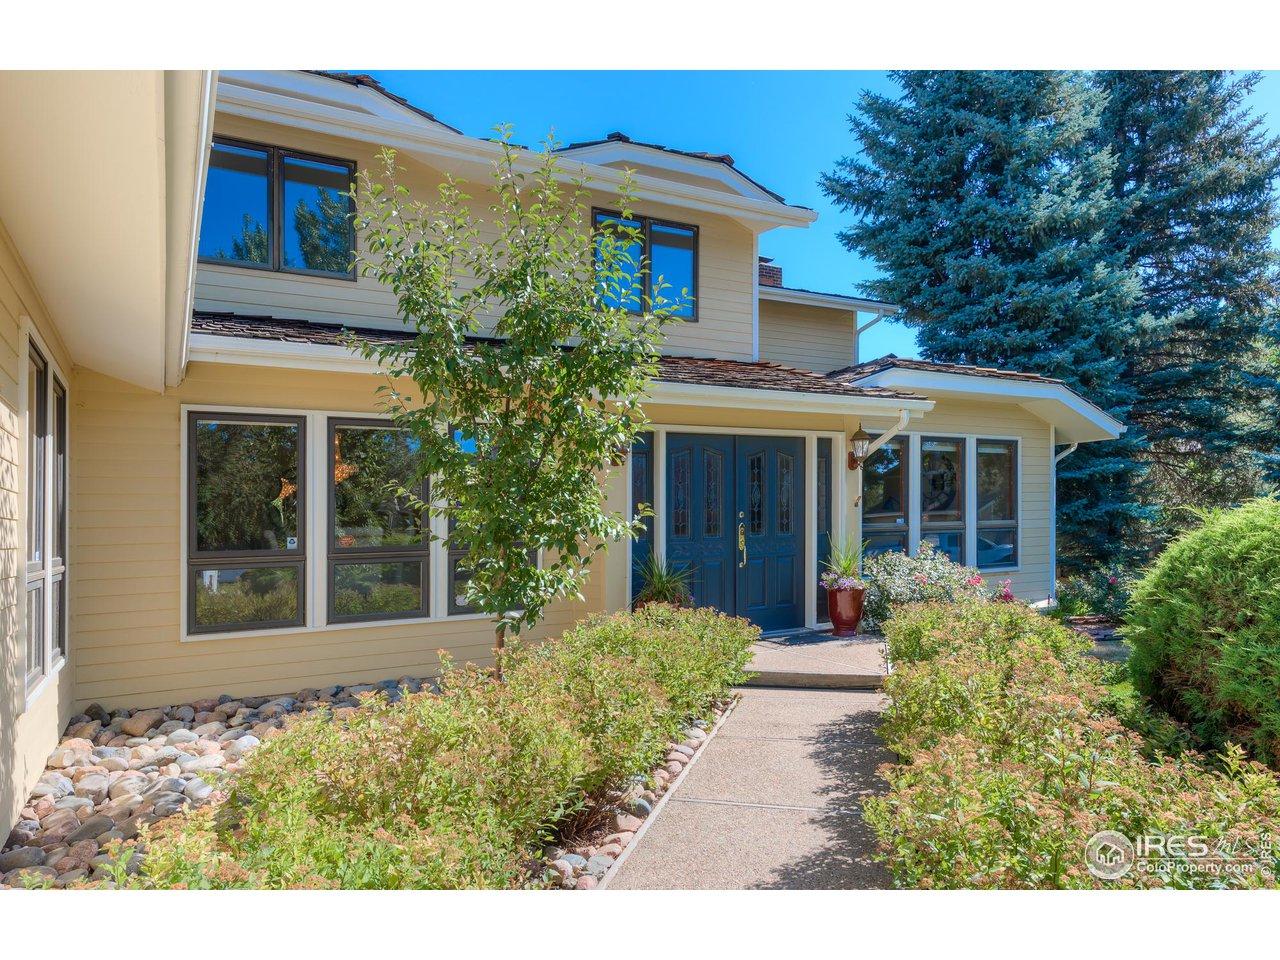 4281 Black Cherry Ct, Boulder CO 80301